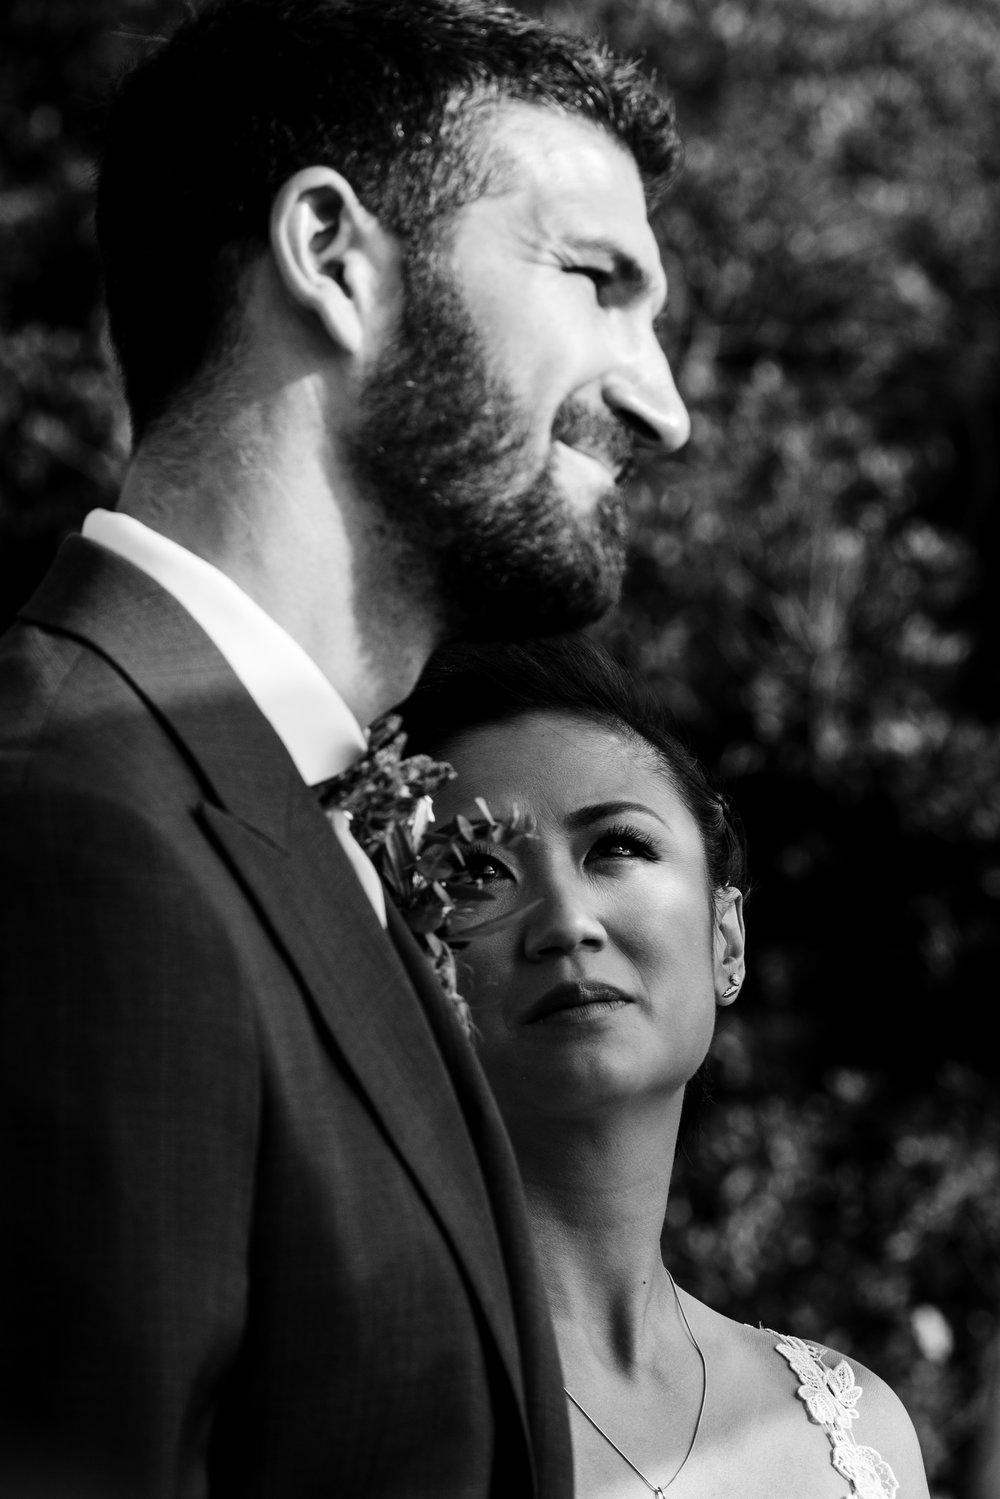 minty-frank-wedding-favorites-131.jpg